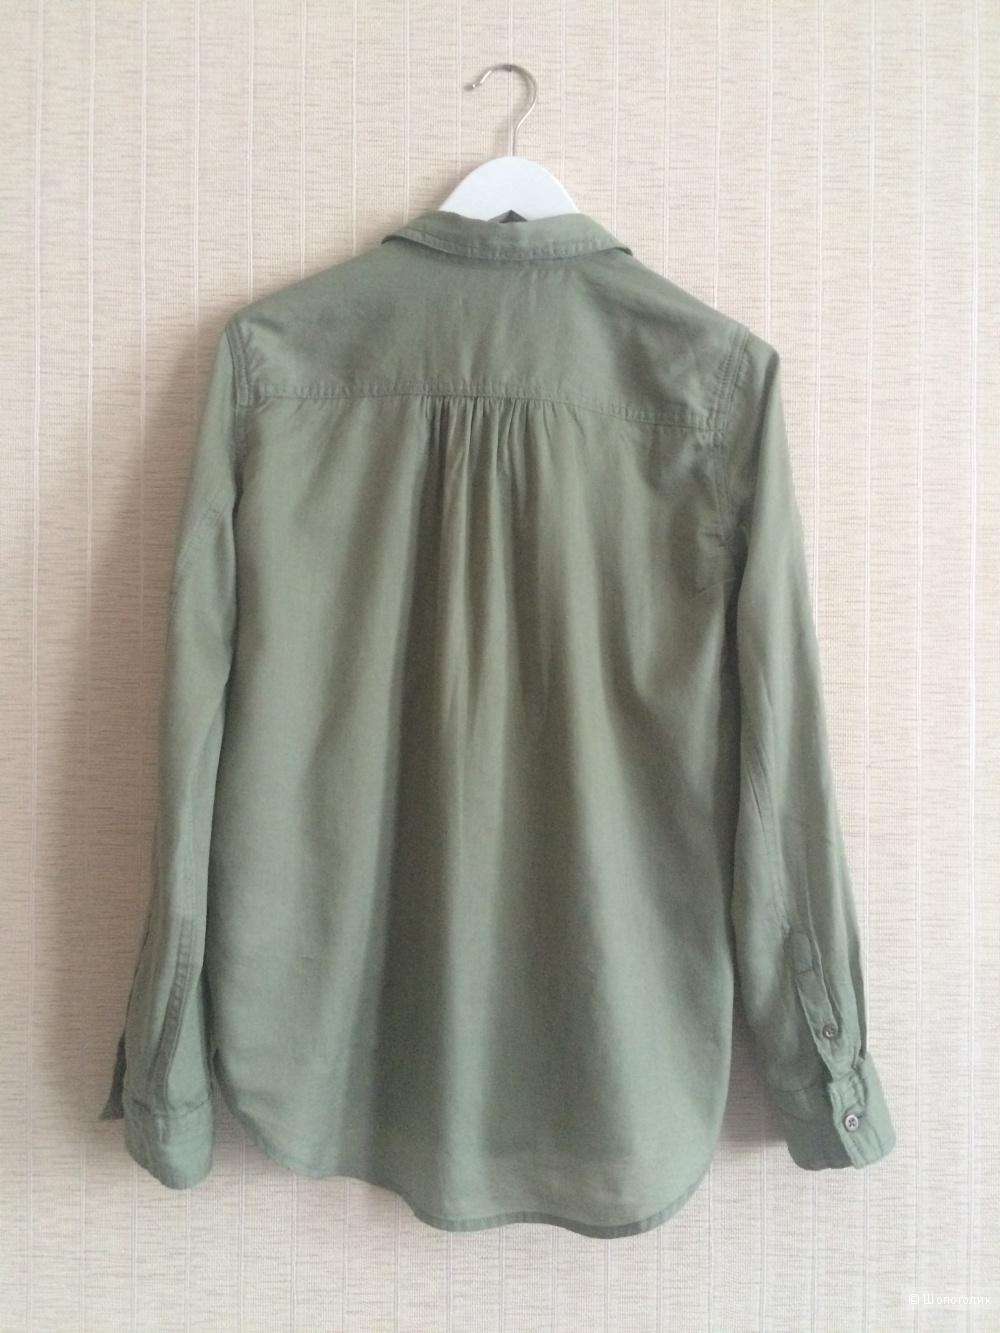 Новая рубашка H&M (коллекция L.O.G.G.) цвета хаки. Размер 40-42.